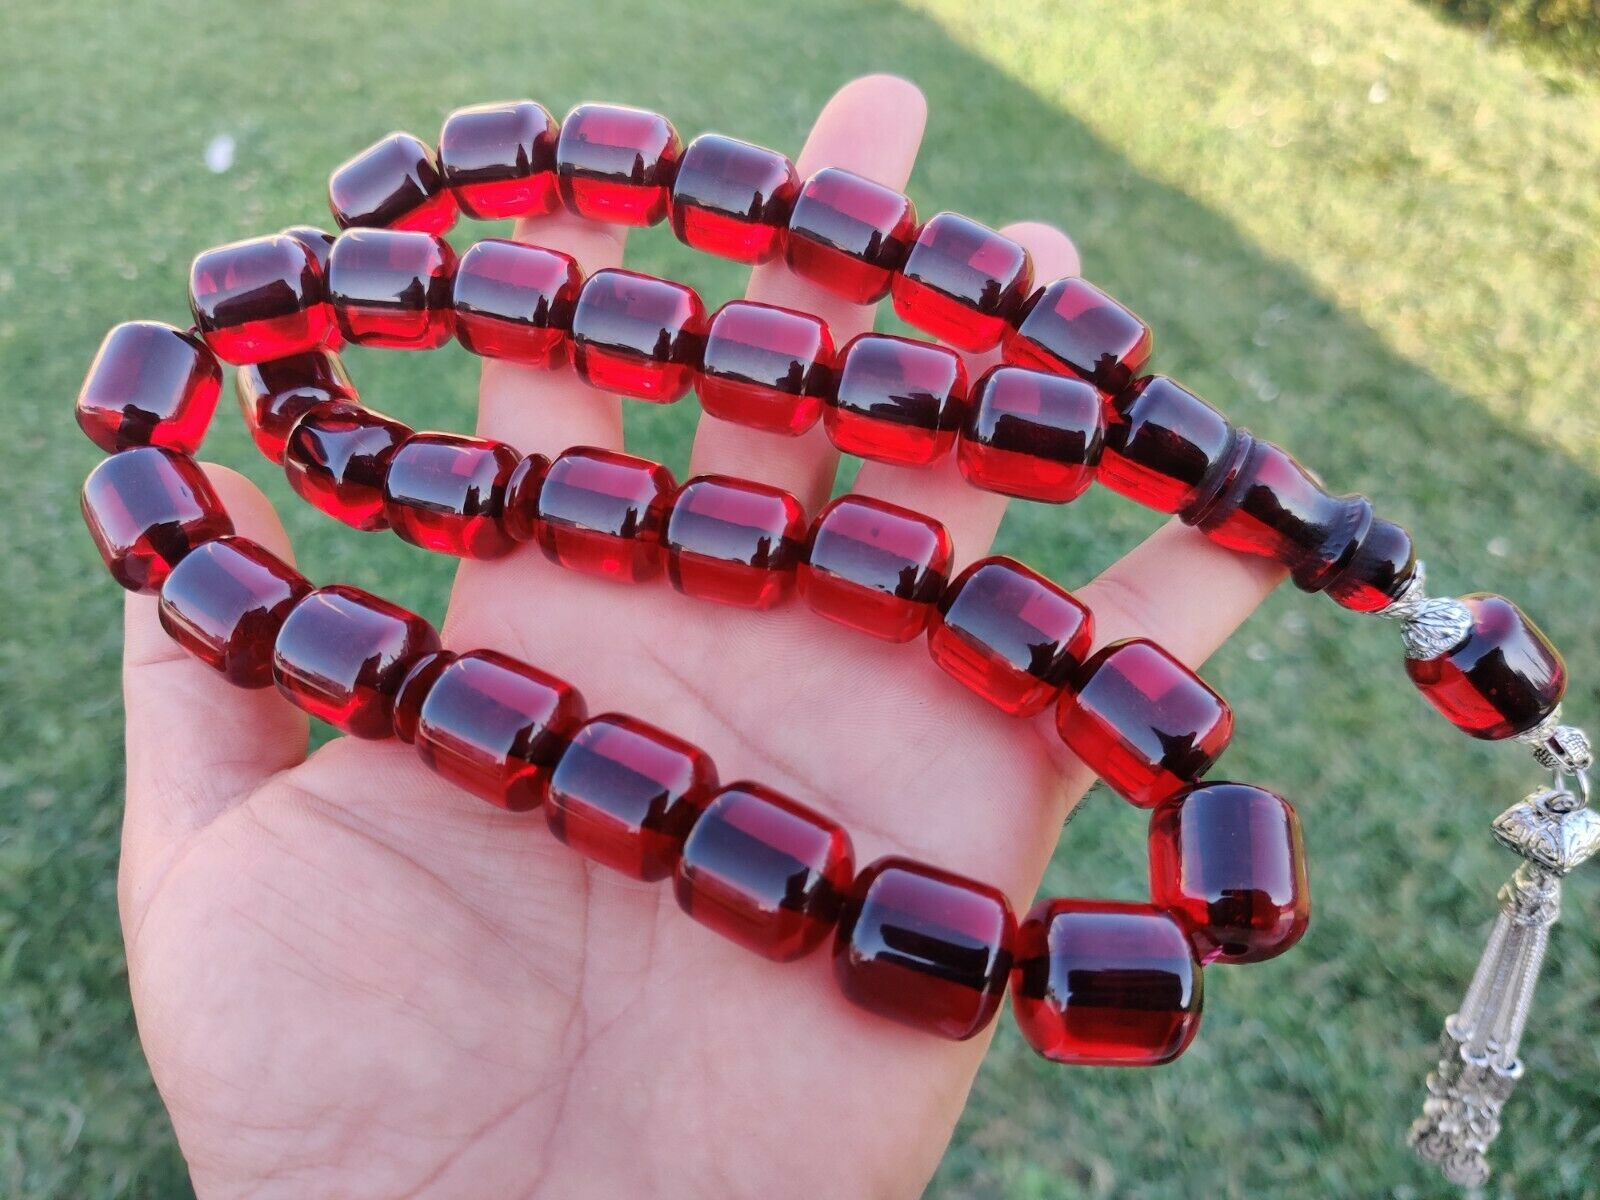 Ottoman Faturan German Amber Sandalous Misbaha Prayer Beads Islamic Gift Tasbih Tasbeeh Tasbeh Rosary Tasbih # 21C